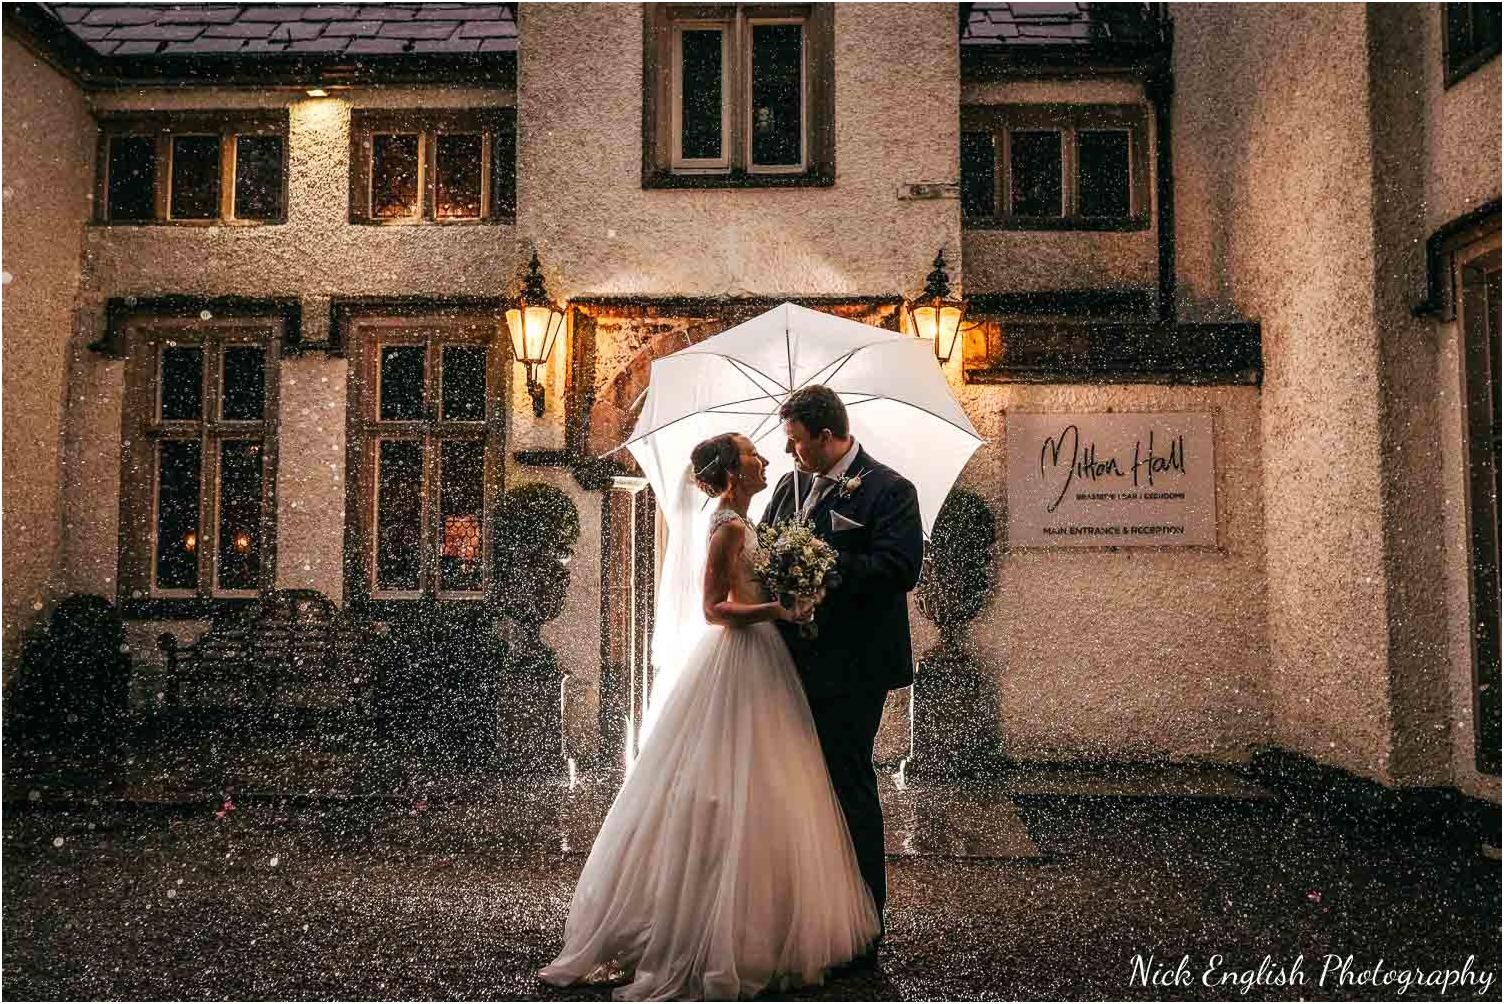 Mitton Hall Wedding Photographer Rain Umbrella Night